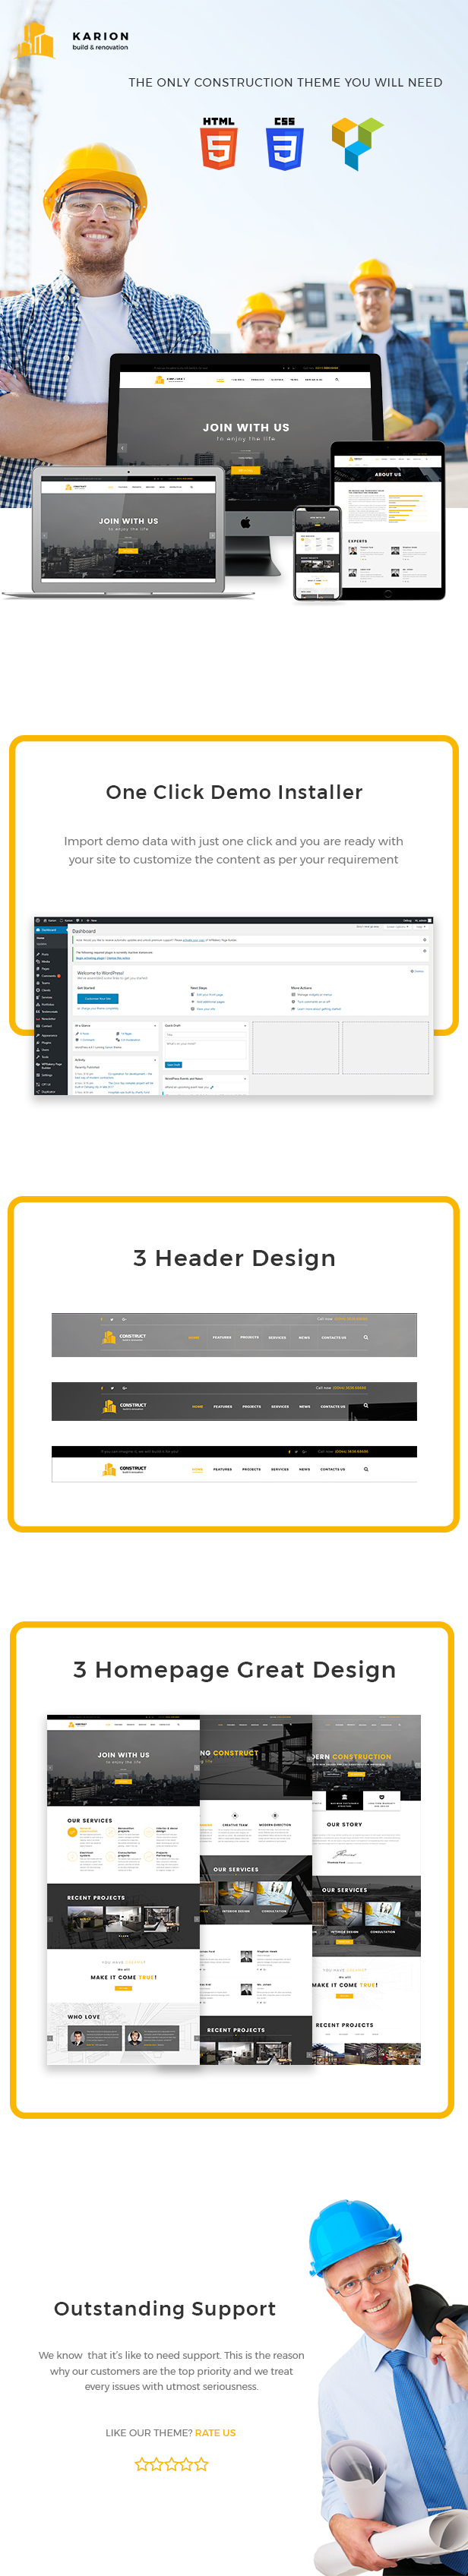 Karion - Construction & Building WordPress Theme - 5